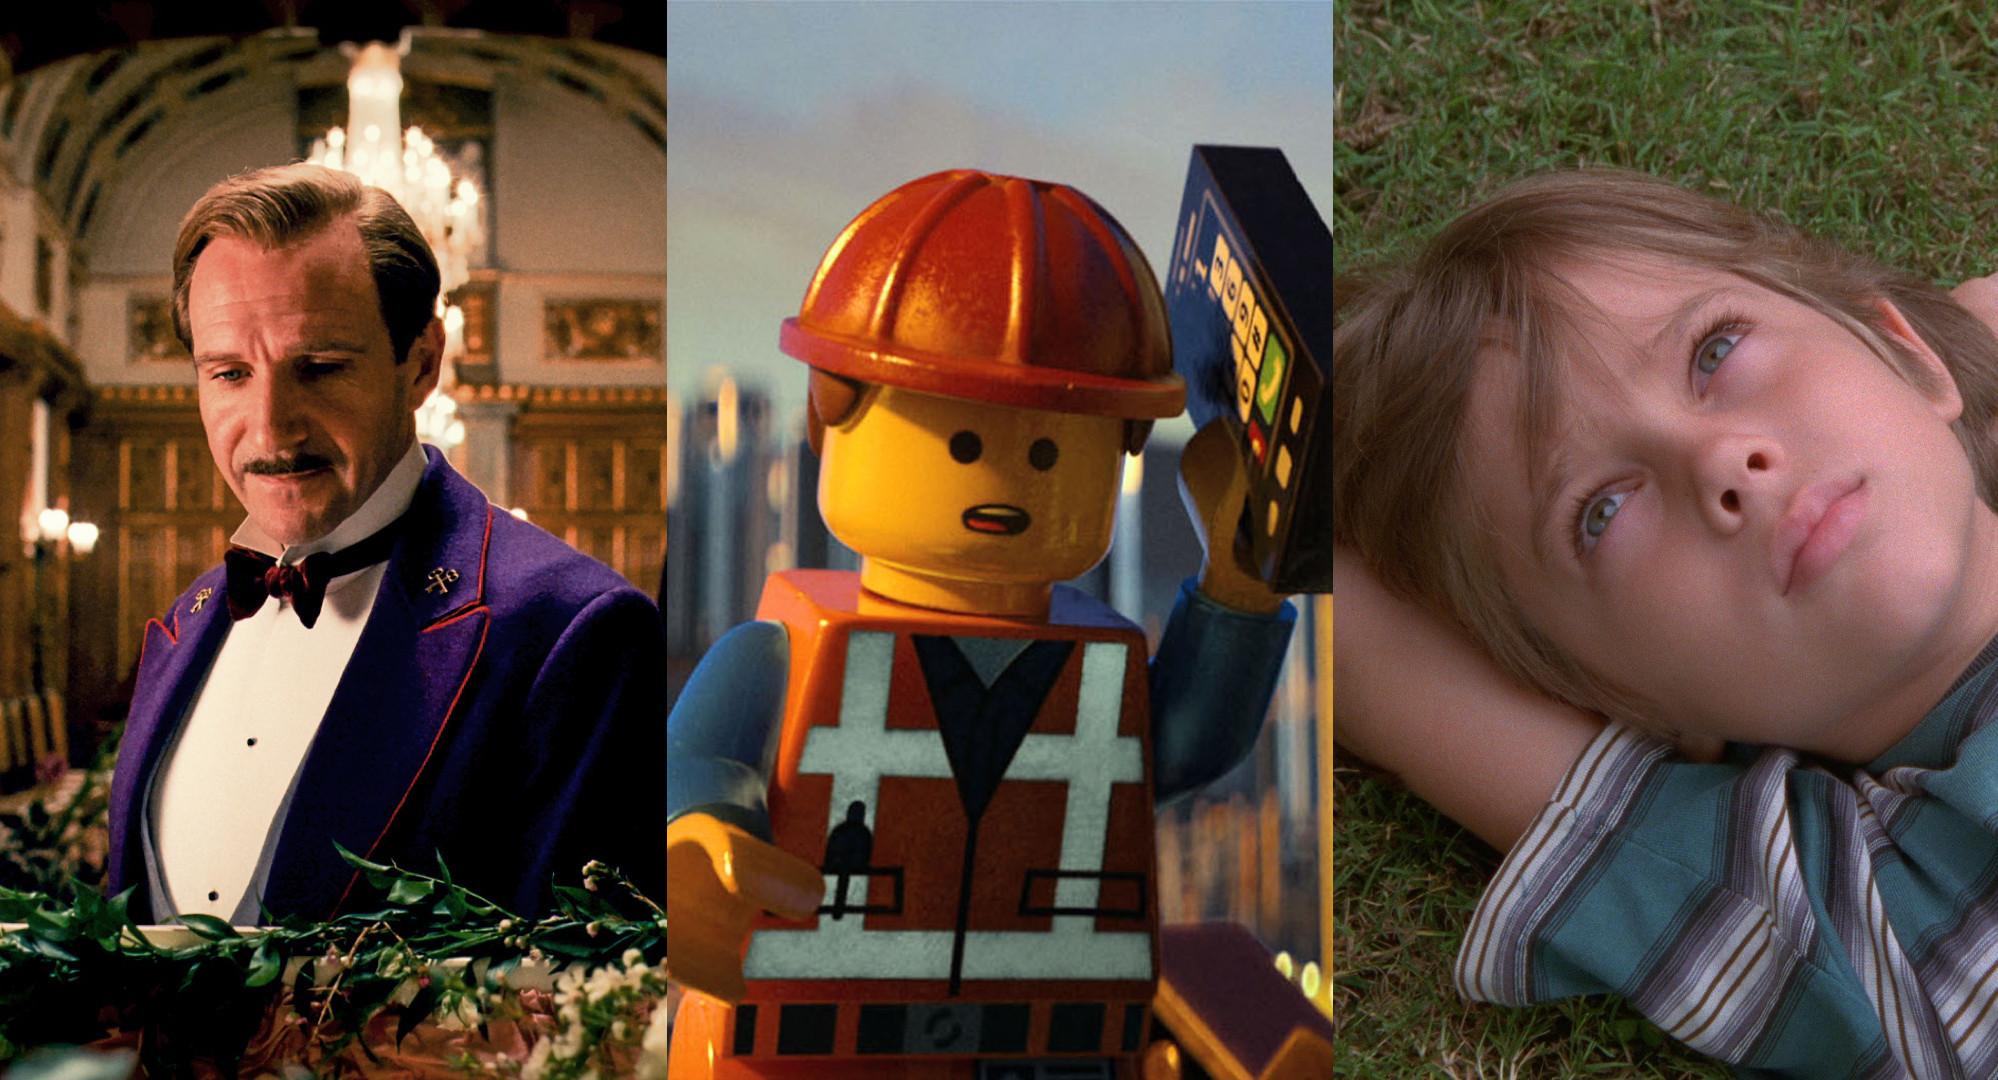 'Boyhood,' 'Grand Budapest Hotel,' 'Lego Movie' win editing honors